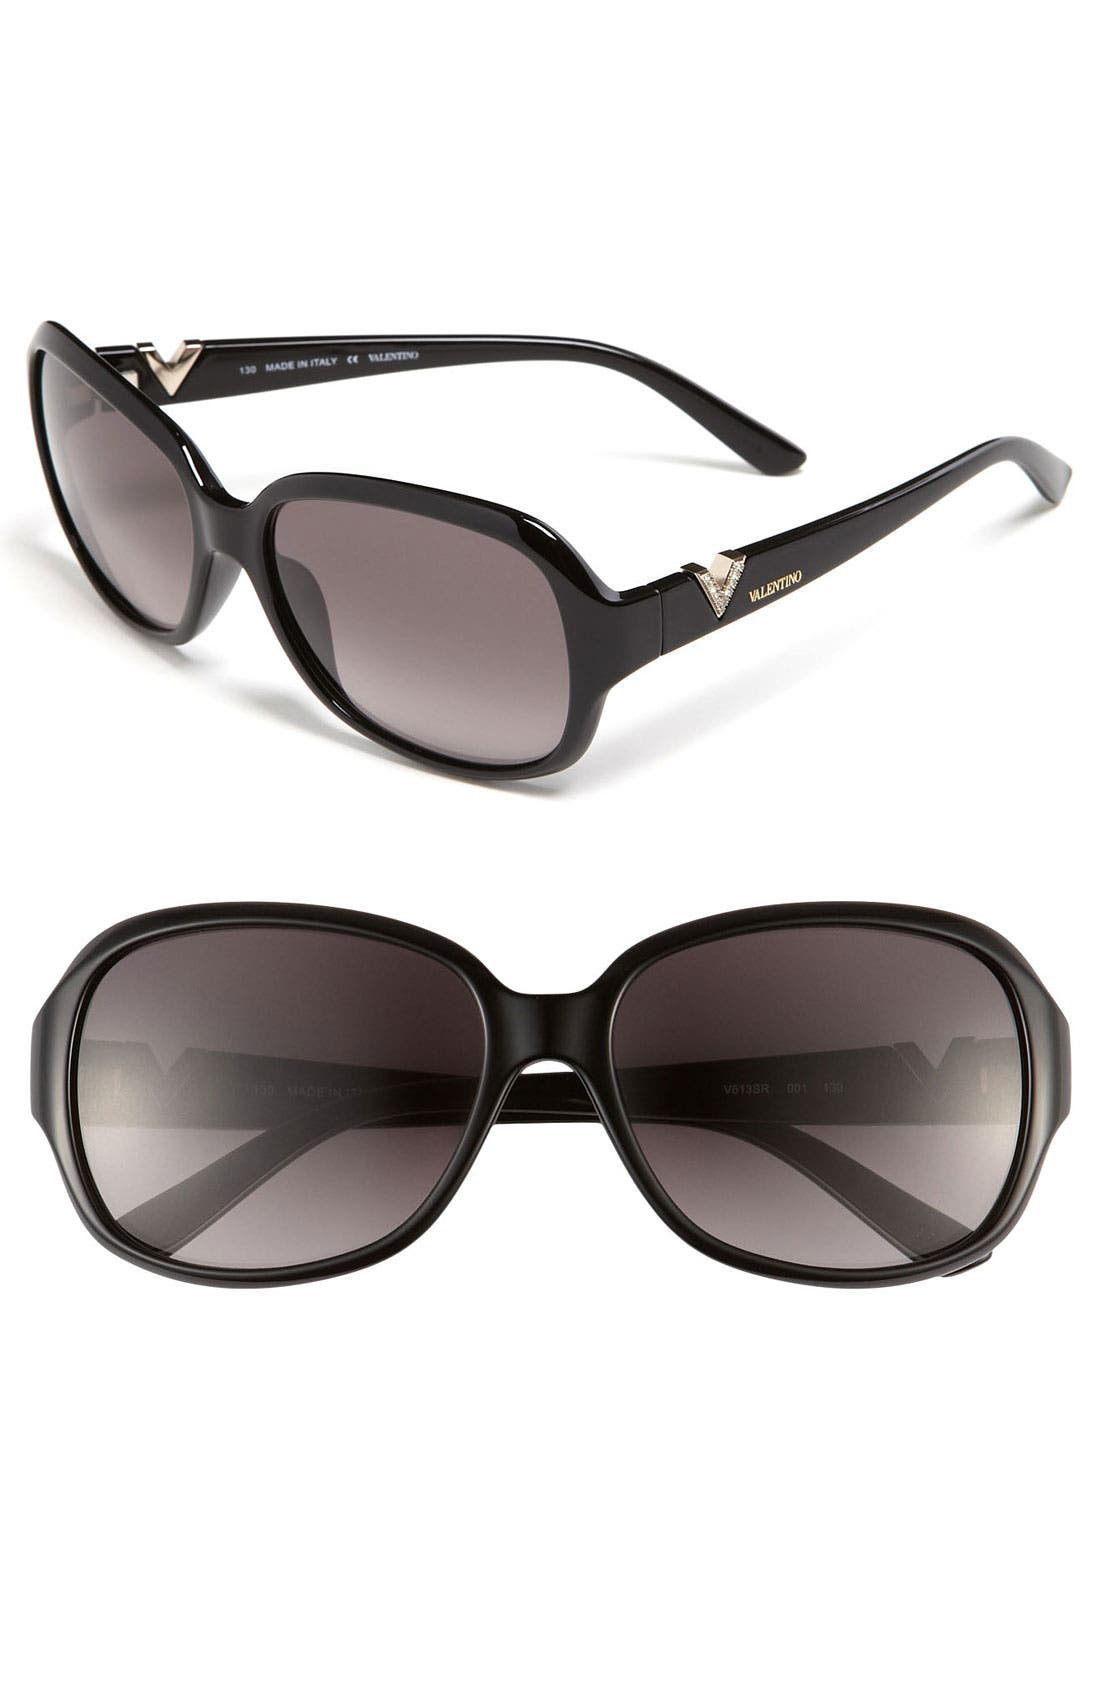 Main Image - Valentino 57mm Classic Sunglasses